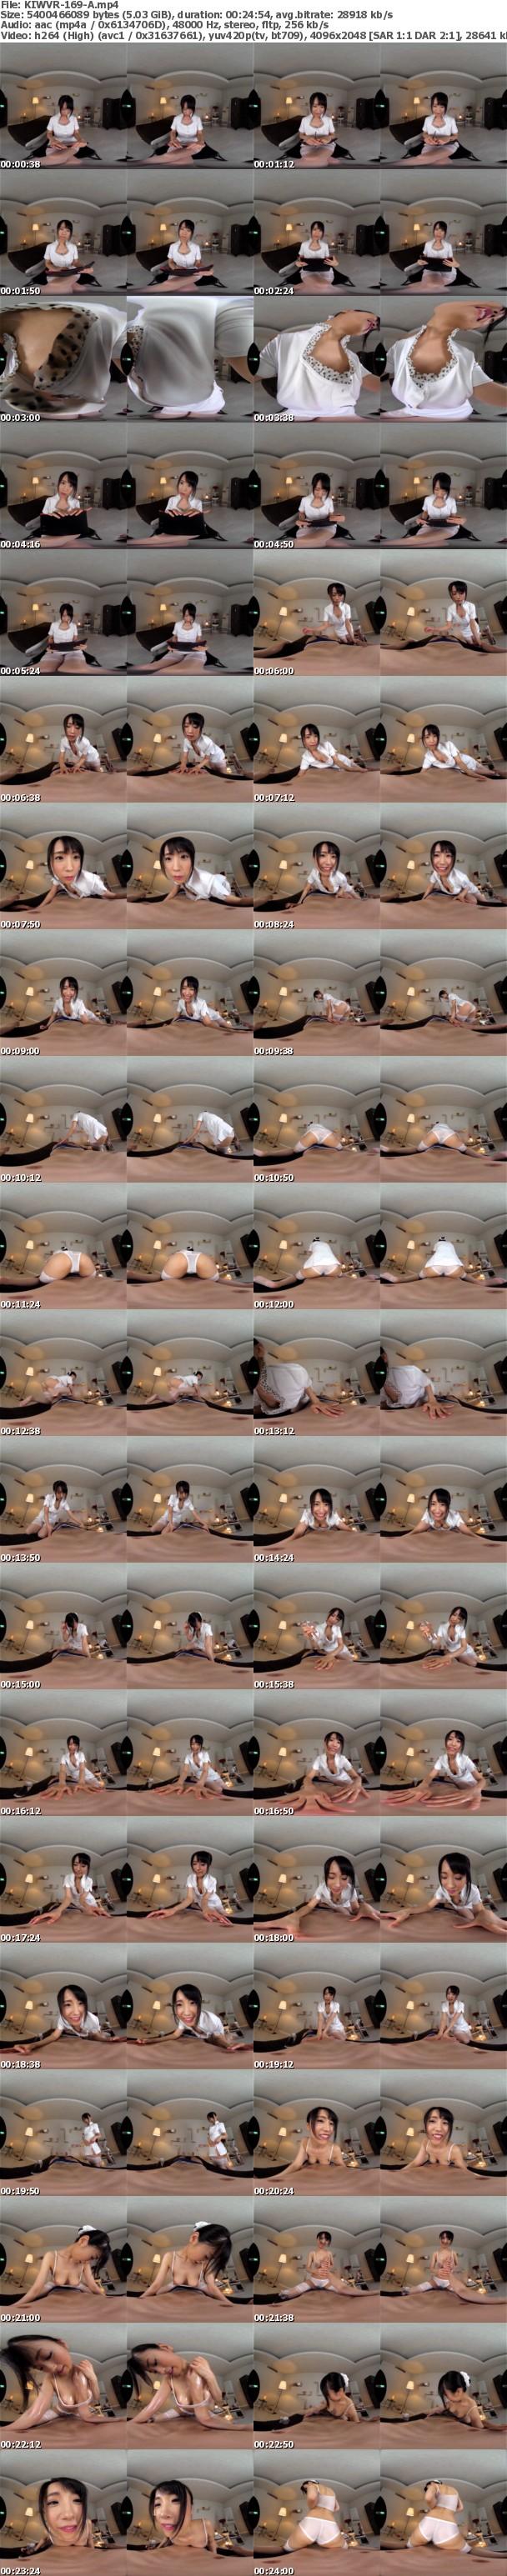 (VR) KIWVR-169 本番禁止なはずなのに性欲UPの【裏メニュー】!! 淫語と極上テクで優しく責めてくれるHカップ美爆乳S級エステ嬢と【射精連発】オイルだくだく濃厚中出しFUCK 長瀬麻美